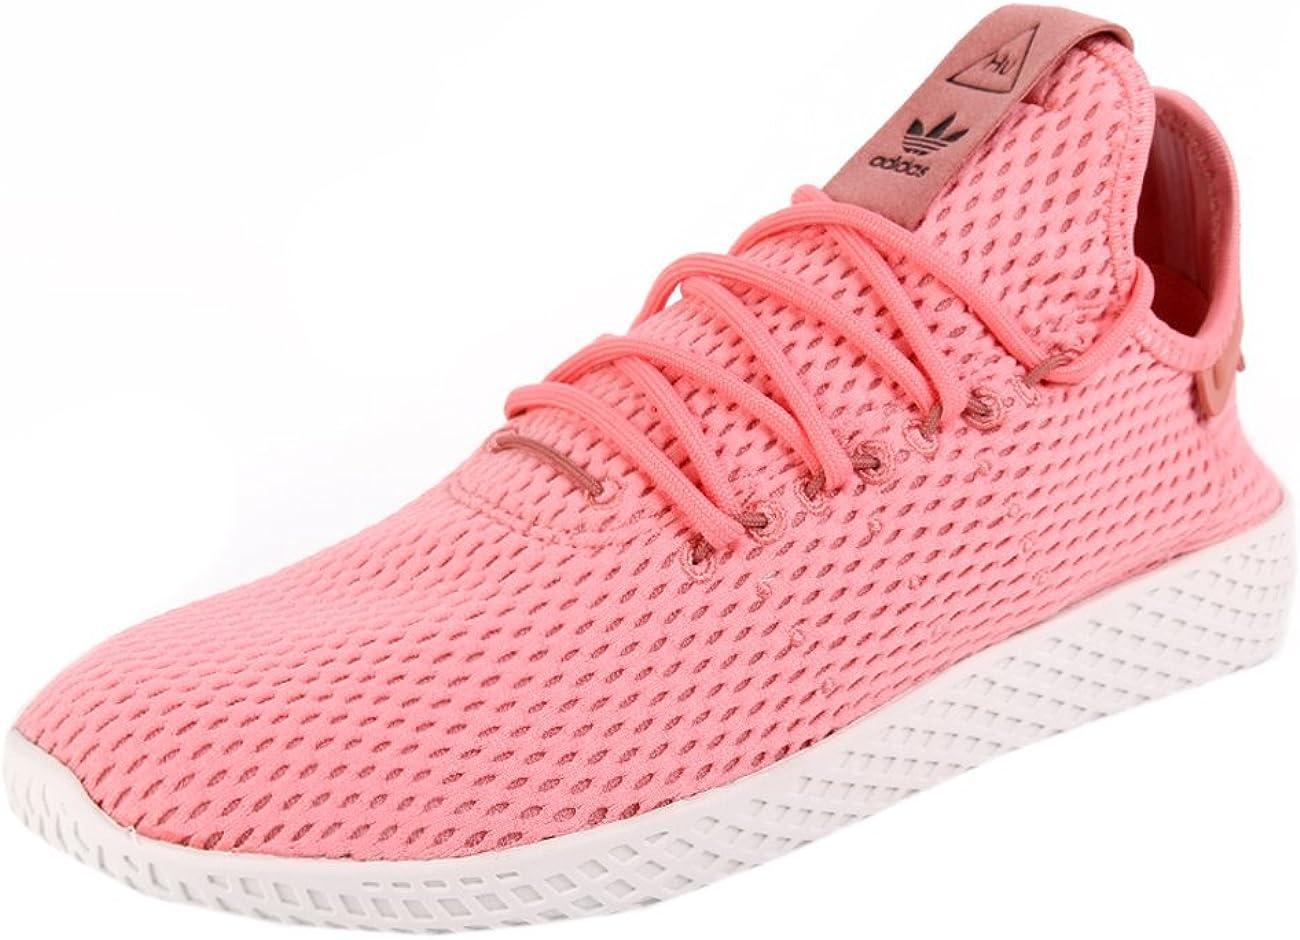 Con fecha de Acostumbrar Interpretación  Amazon.com | adidas Originals PW Tennis HU Mens Trainers Sneakers (UK 9 US  9.5 EU 43 1/3, Pink White BY8715) | Tennis & Racquet Sports